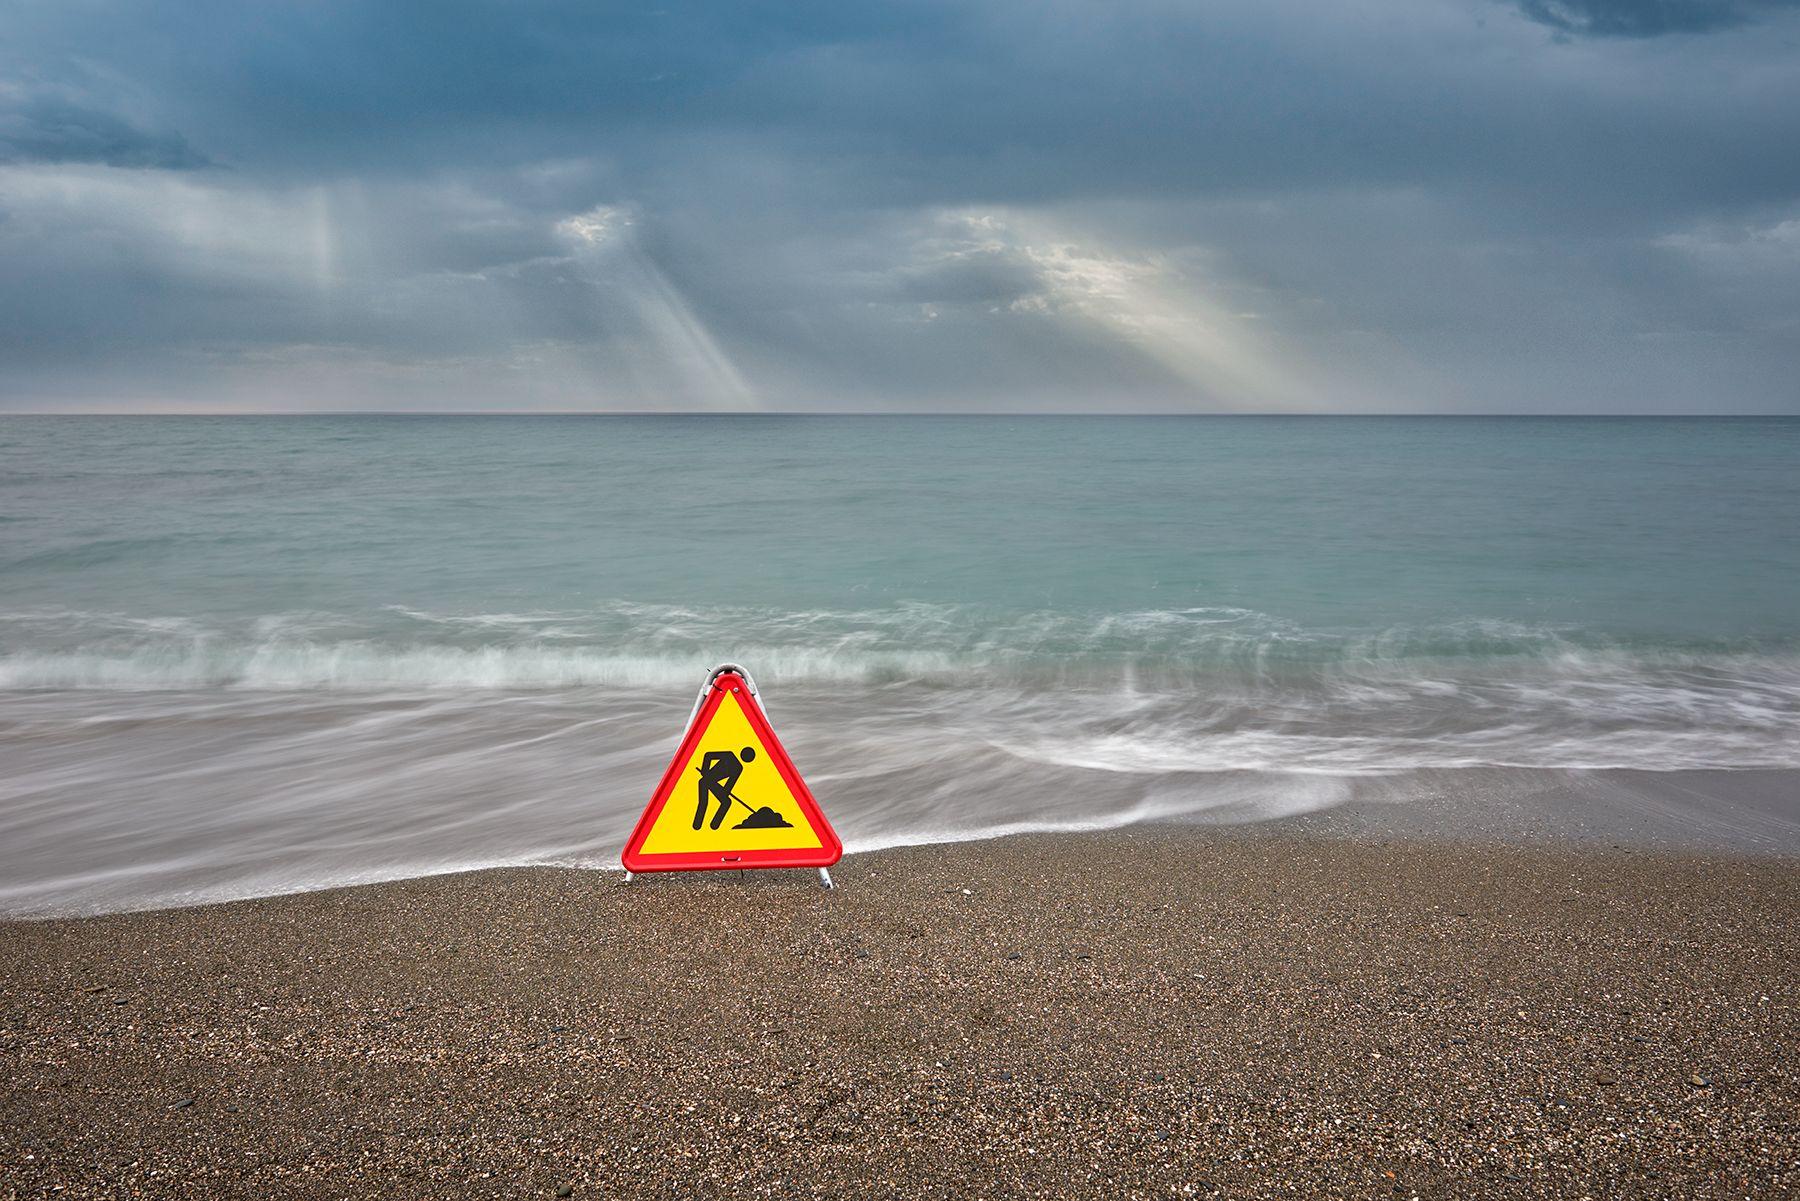 La playa en obras